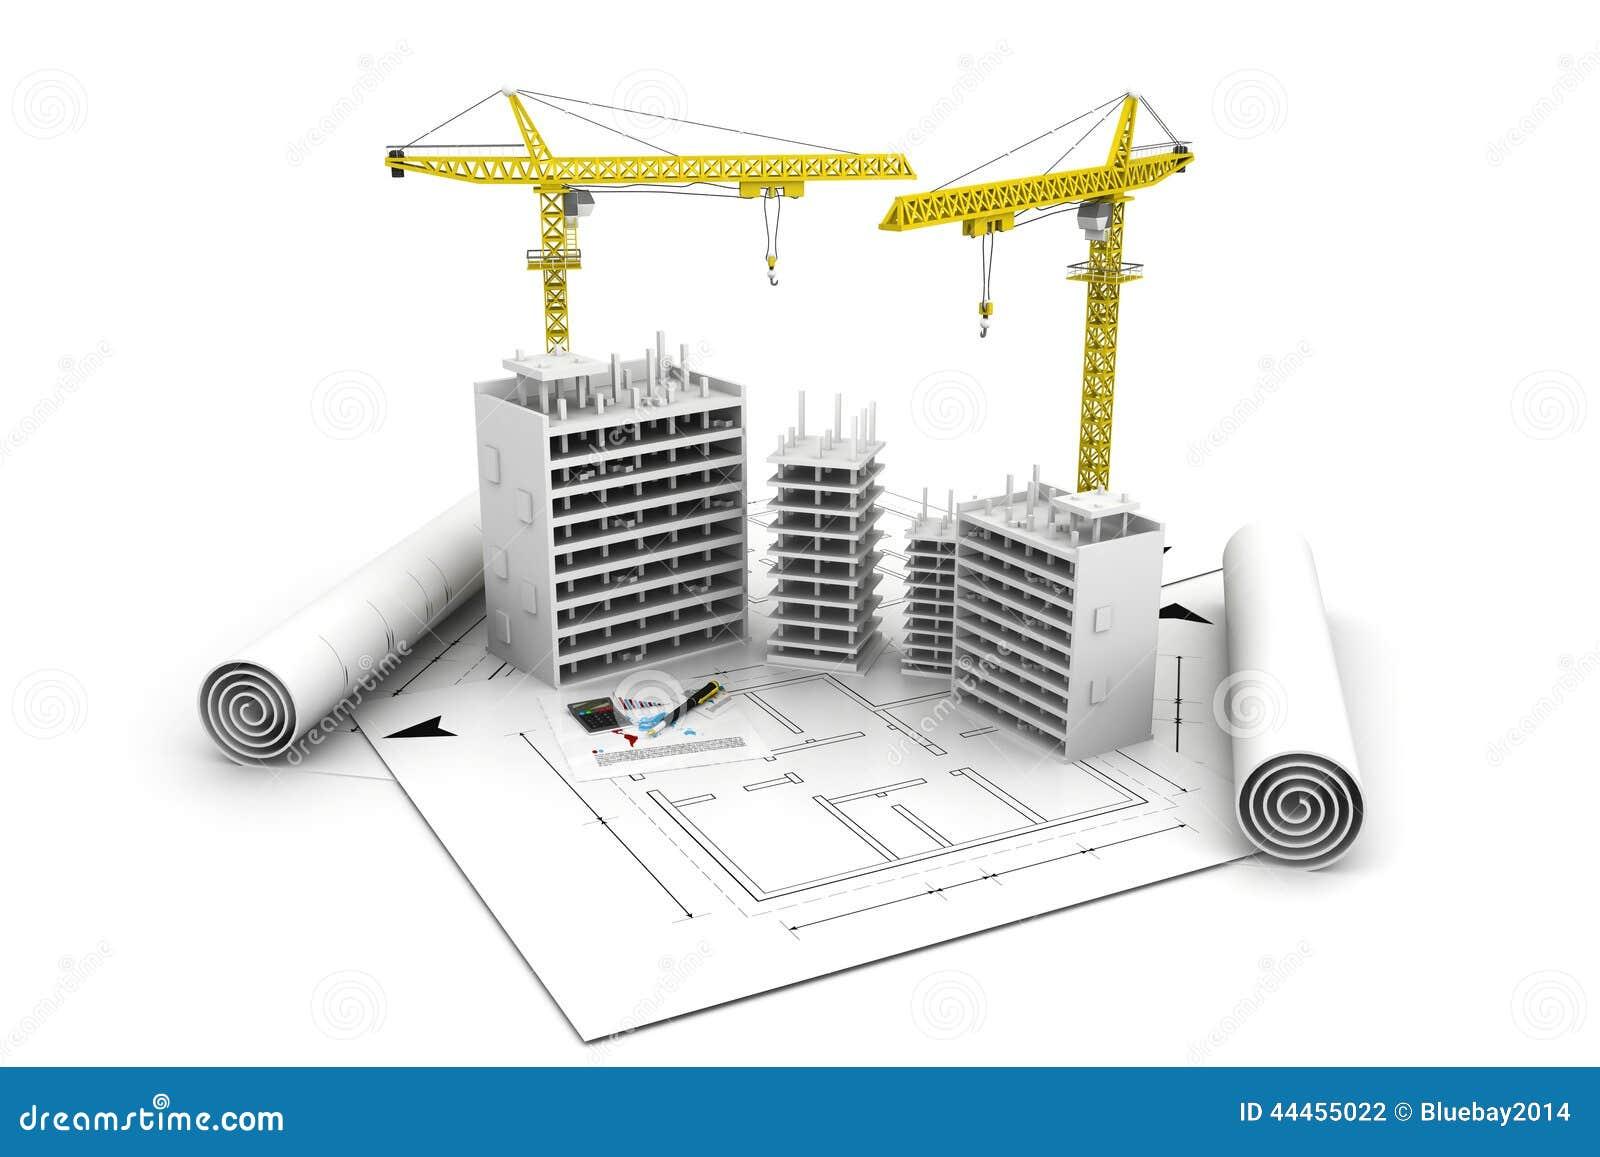 3d building block in construction stock illustration for Construction 3d